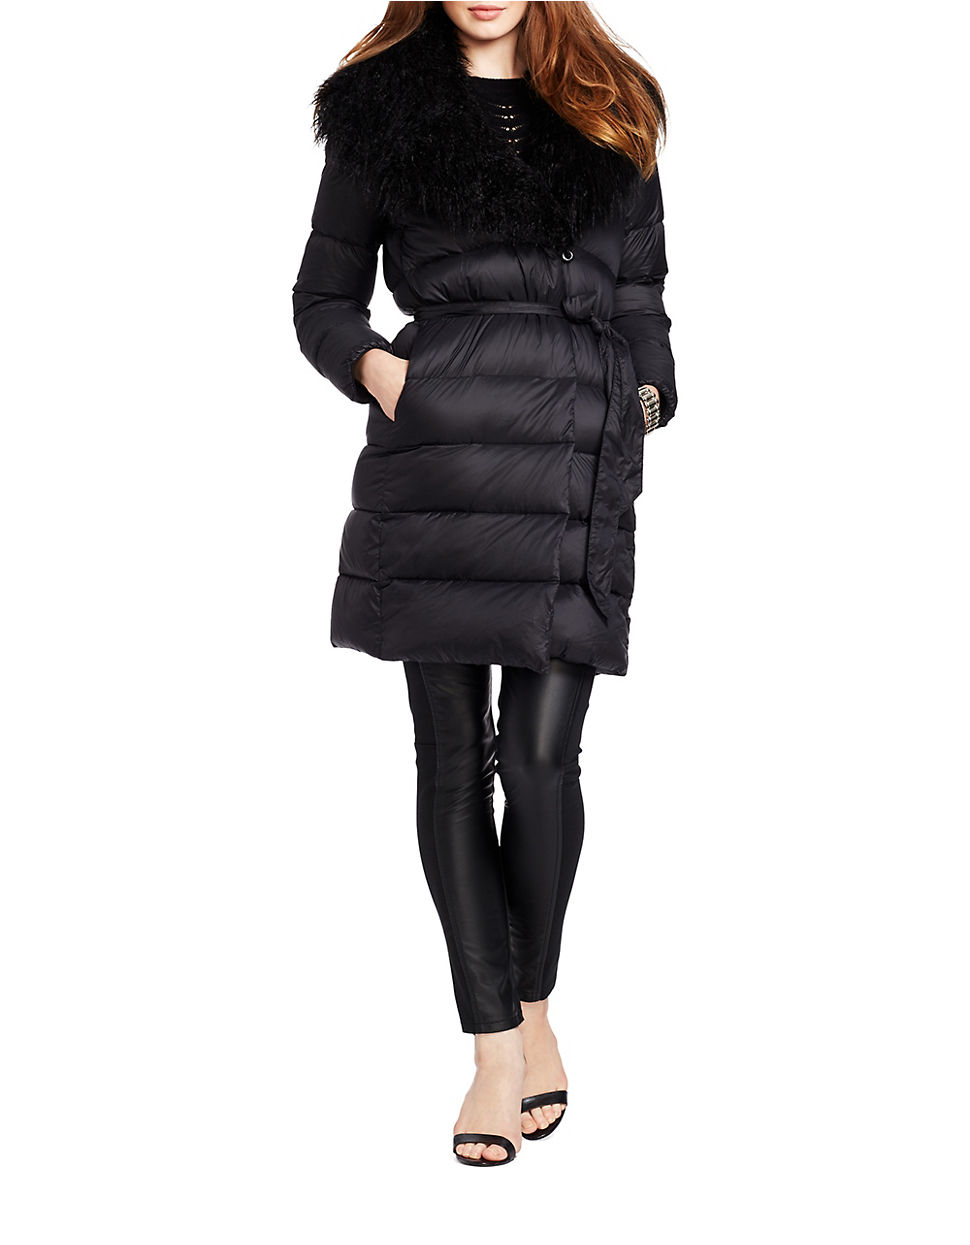 Lauren by ralph lauren Faux Fur-trimmed Quilted Down Wrap ...